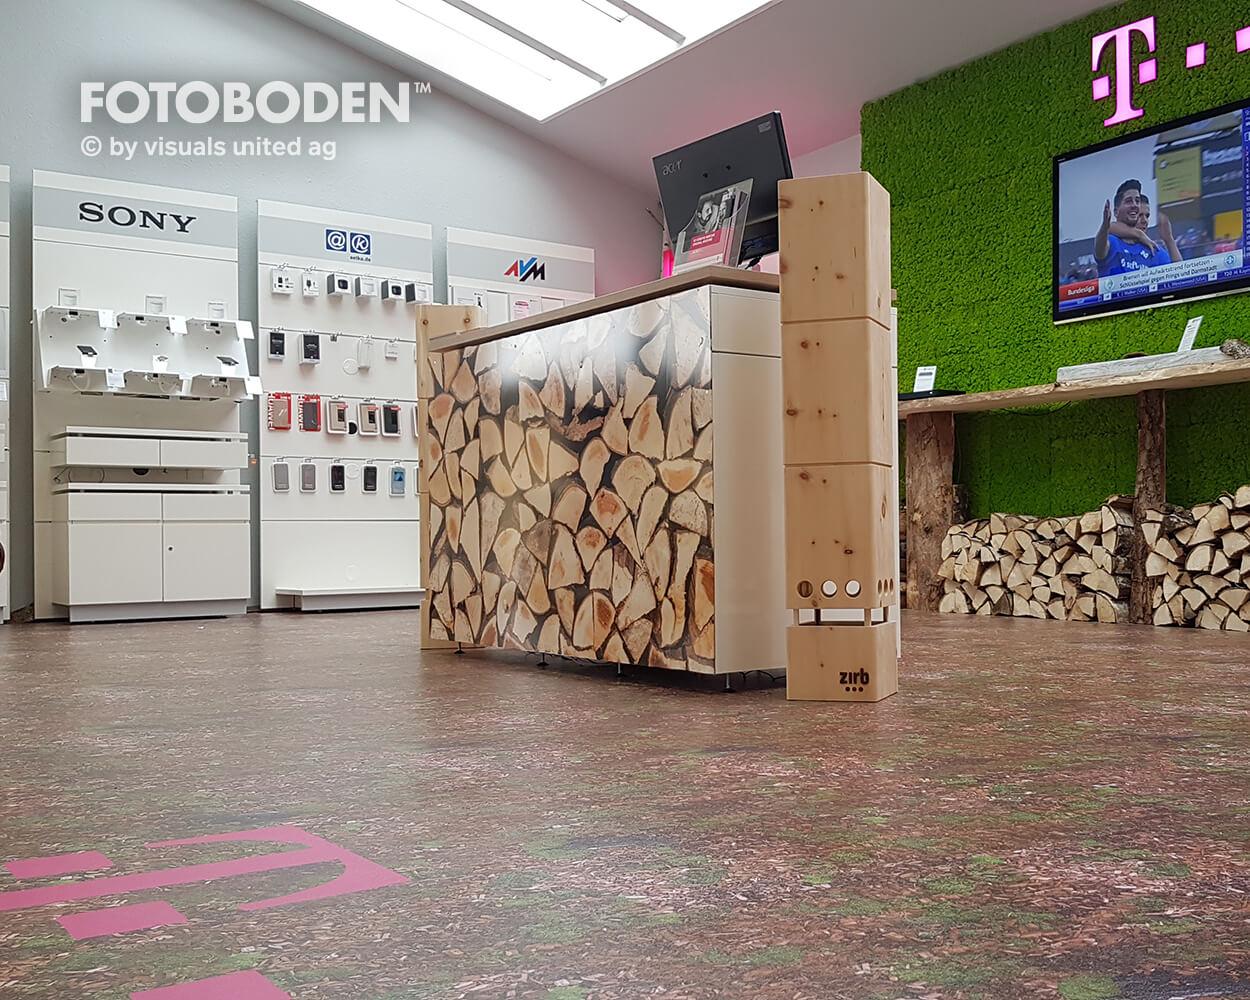 Telekom Showroom Ladenbau Ladengestaltung Fußboden Verkaufsfläche Bodengestaltung Boden Foto Fotoboden Fotomotiv Motiv Druck Visual Merchandising Point Of Sale POS(4)